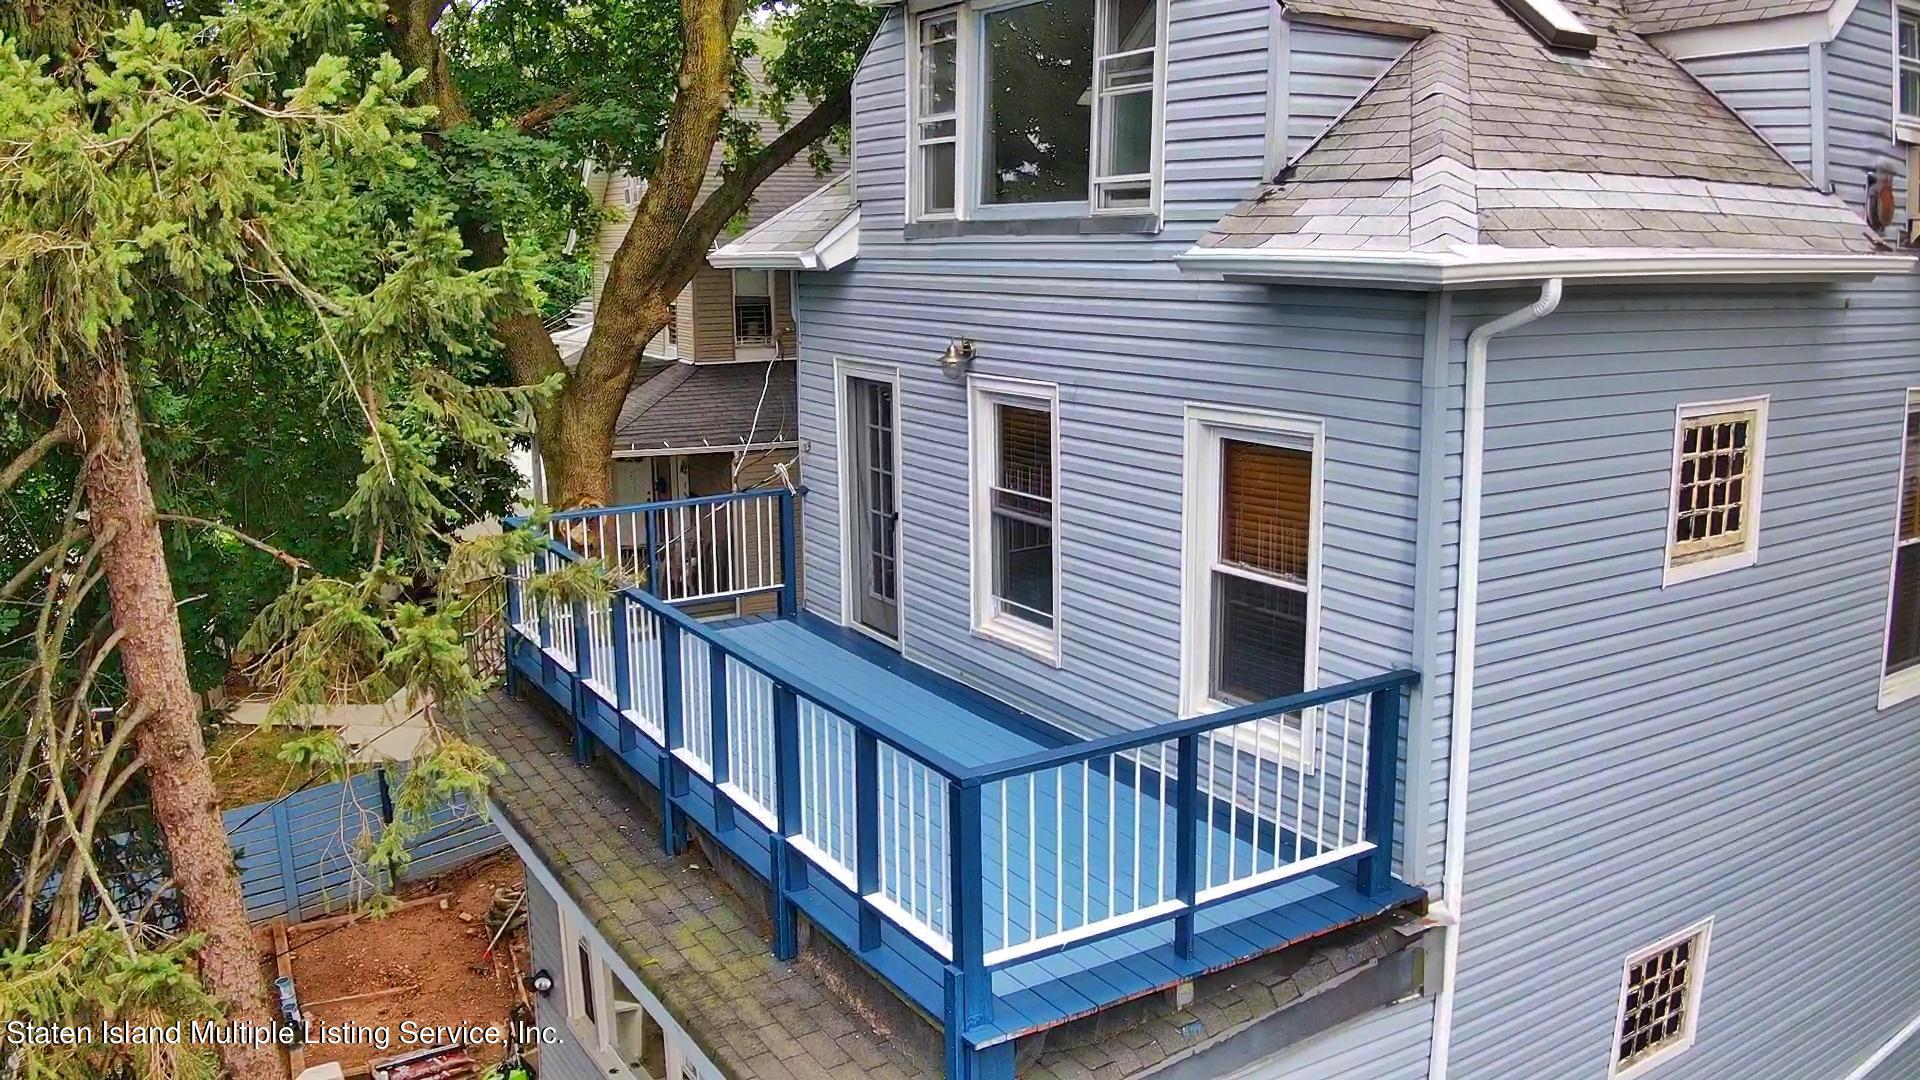 Single Family - Detached 136 York Avenue  Staten Island, NY 10301, MLS-1147575-3